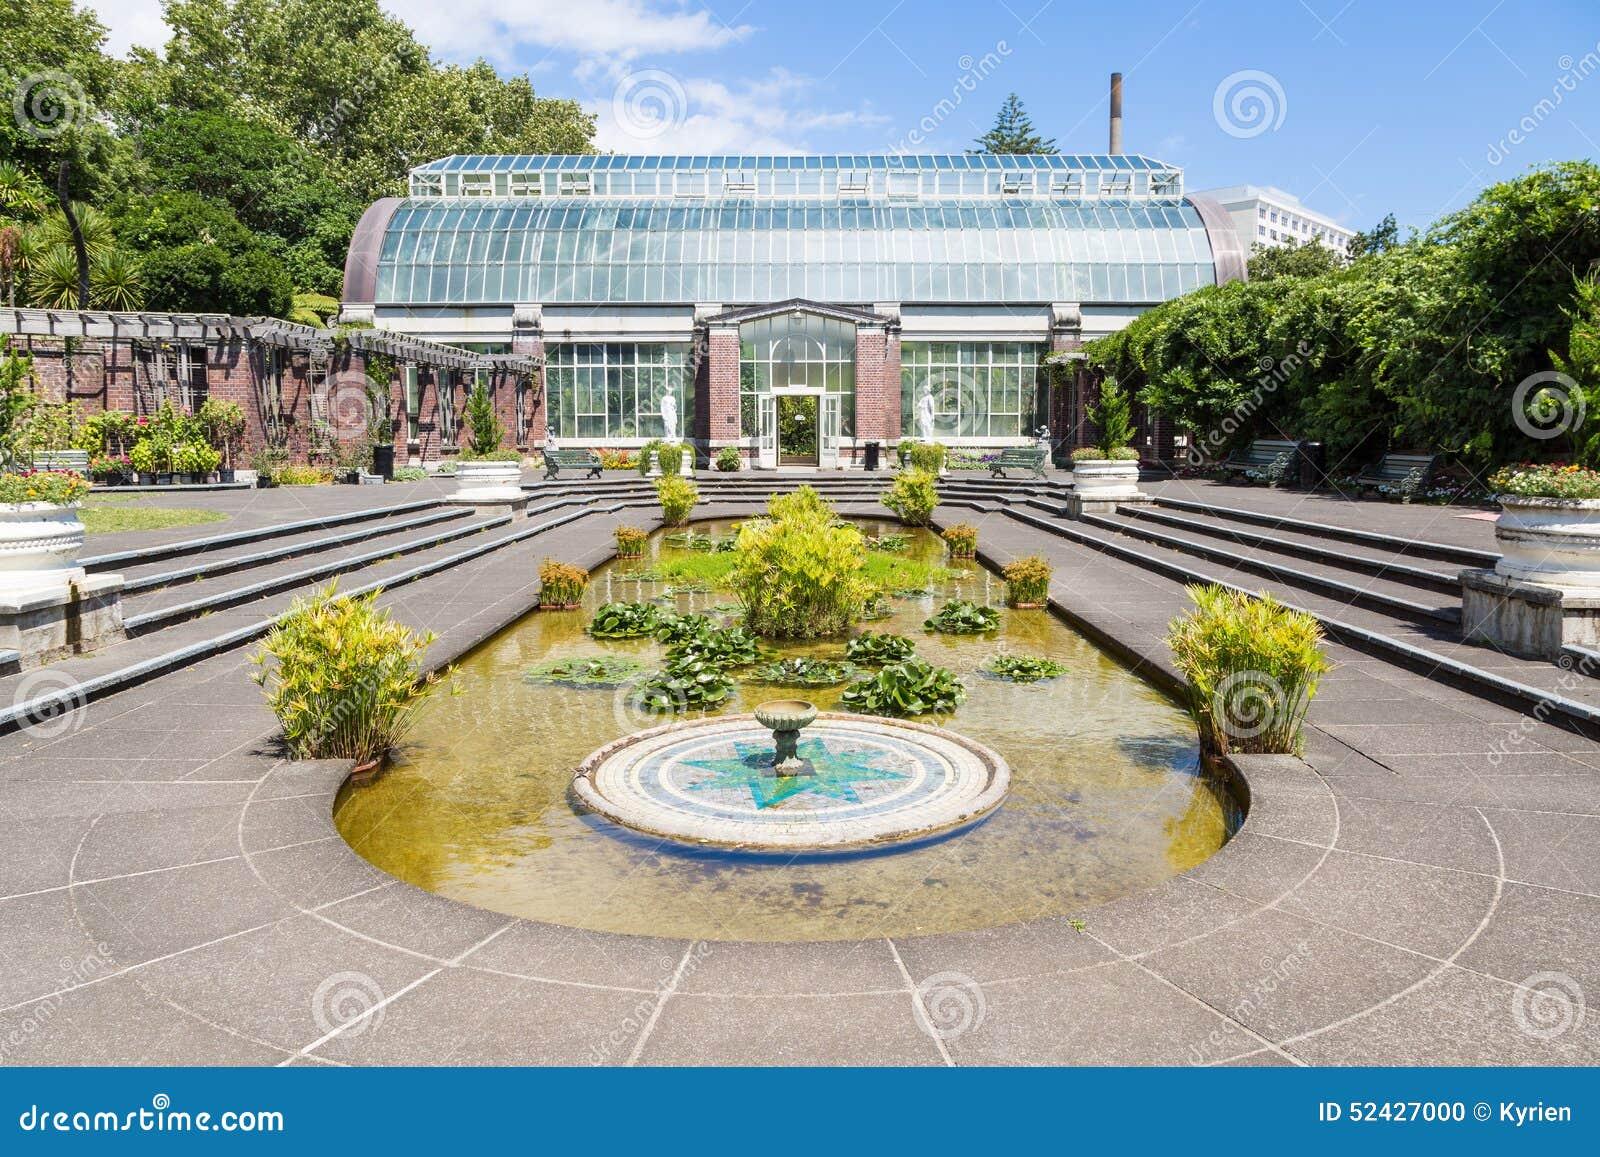 auckland wintergarden pavilion stock photo image 52427000